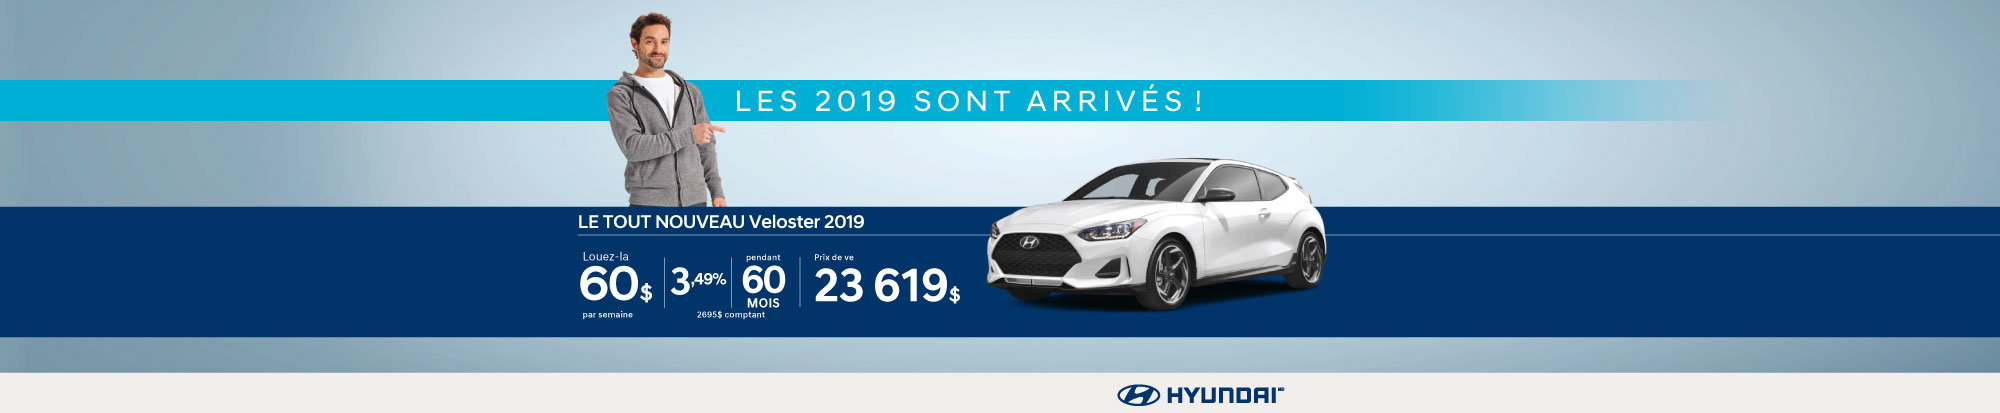 Nos Hyundai Veloster 2019 sont arrivés! web